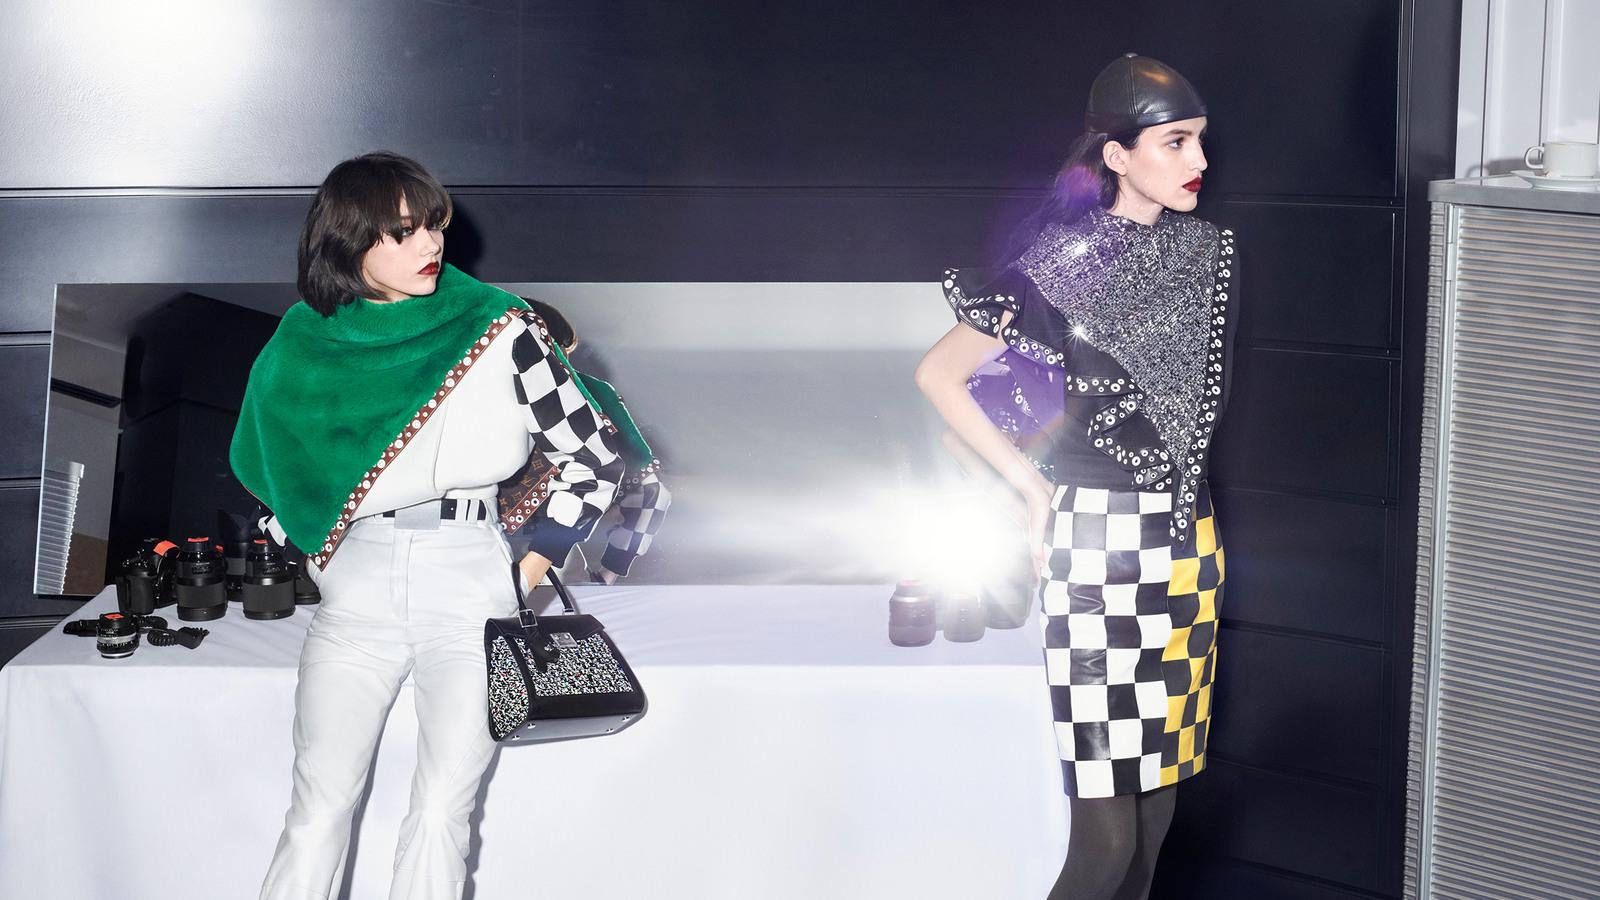 Chiến dịch Thu Đông 2019 Louis Vuitton